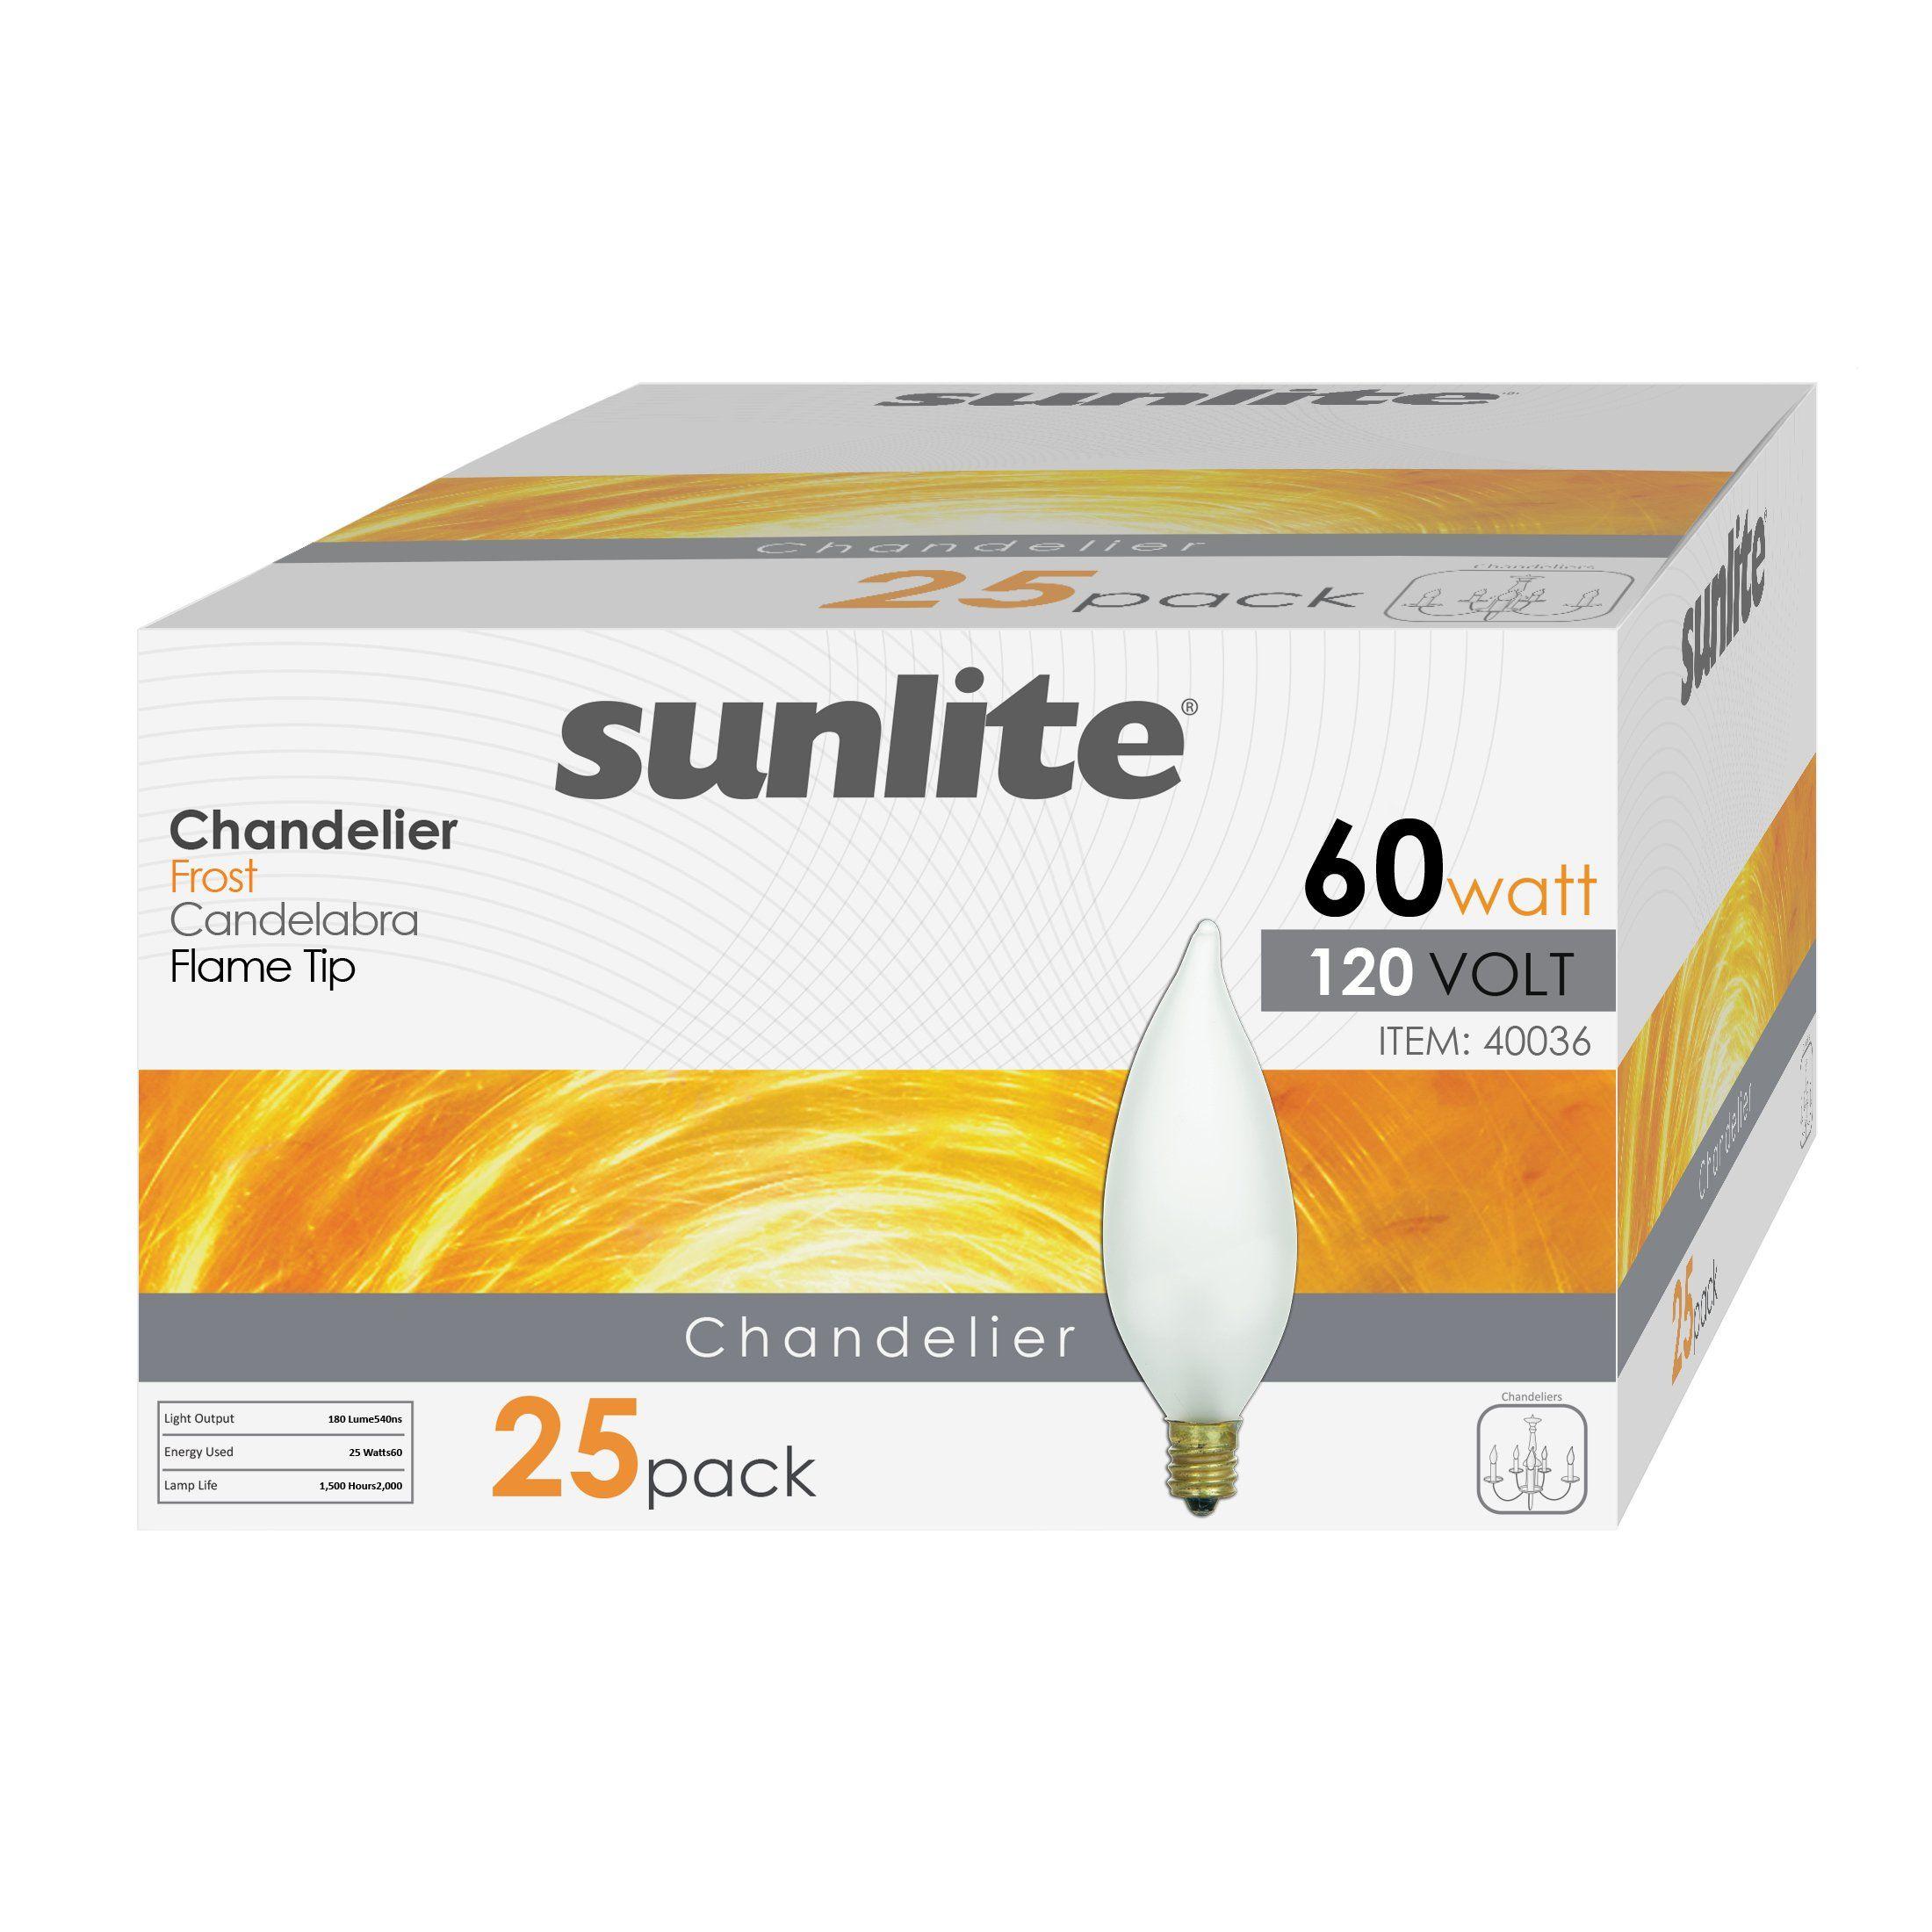 Sunlite 60CFF/32/25PK Candelabra (E12) Base Flame Tip 60W Incandescent Chandelier Frosted Bulb (25 Pack)